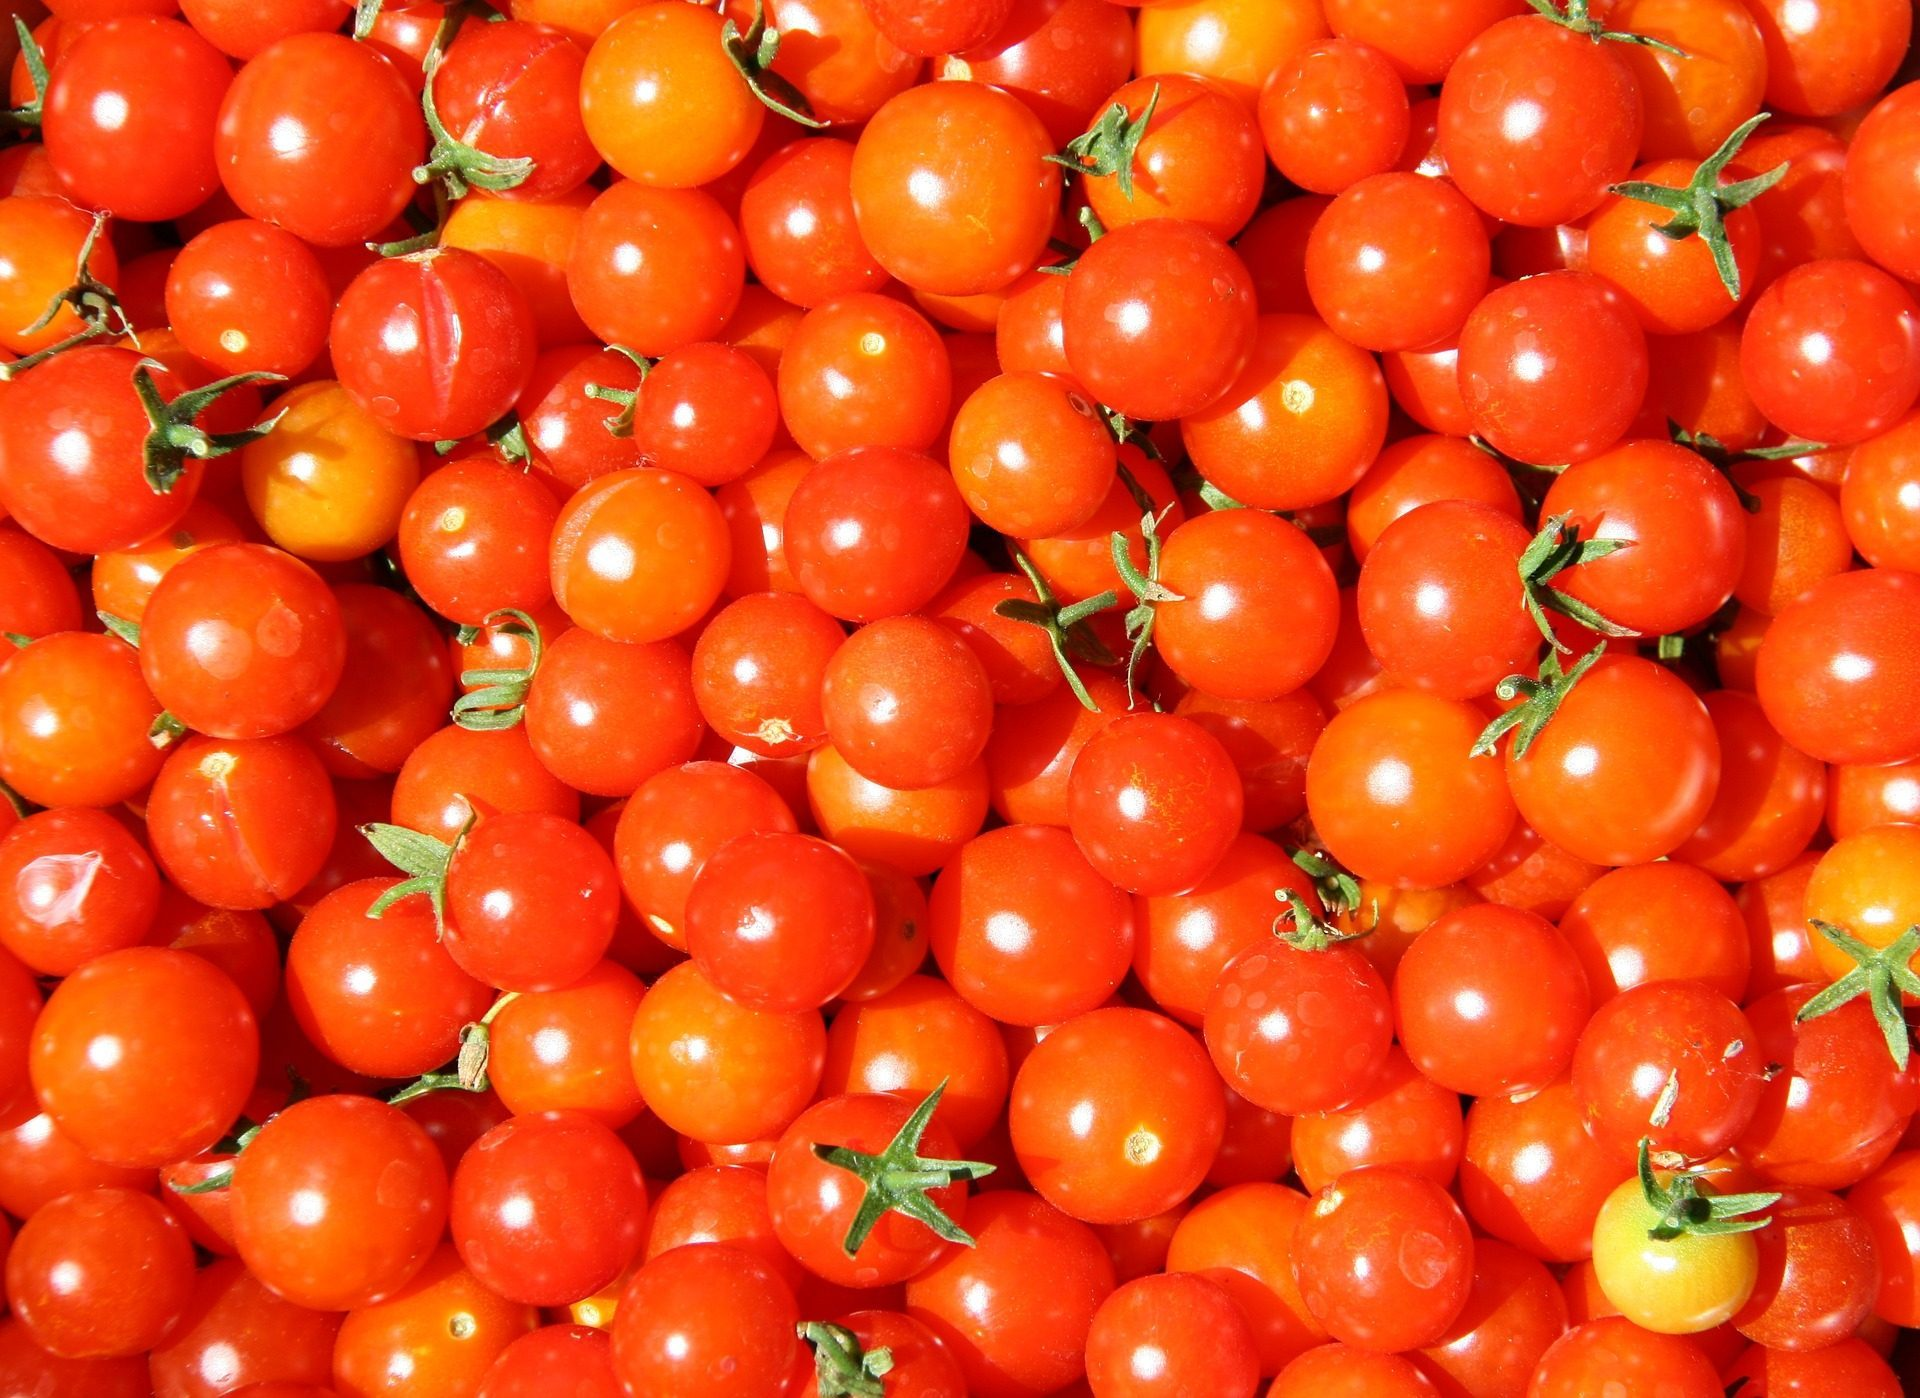 tomatoes-835385_1920